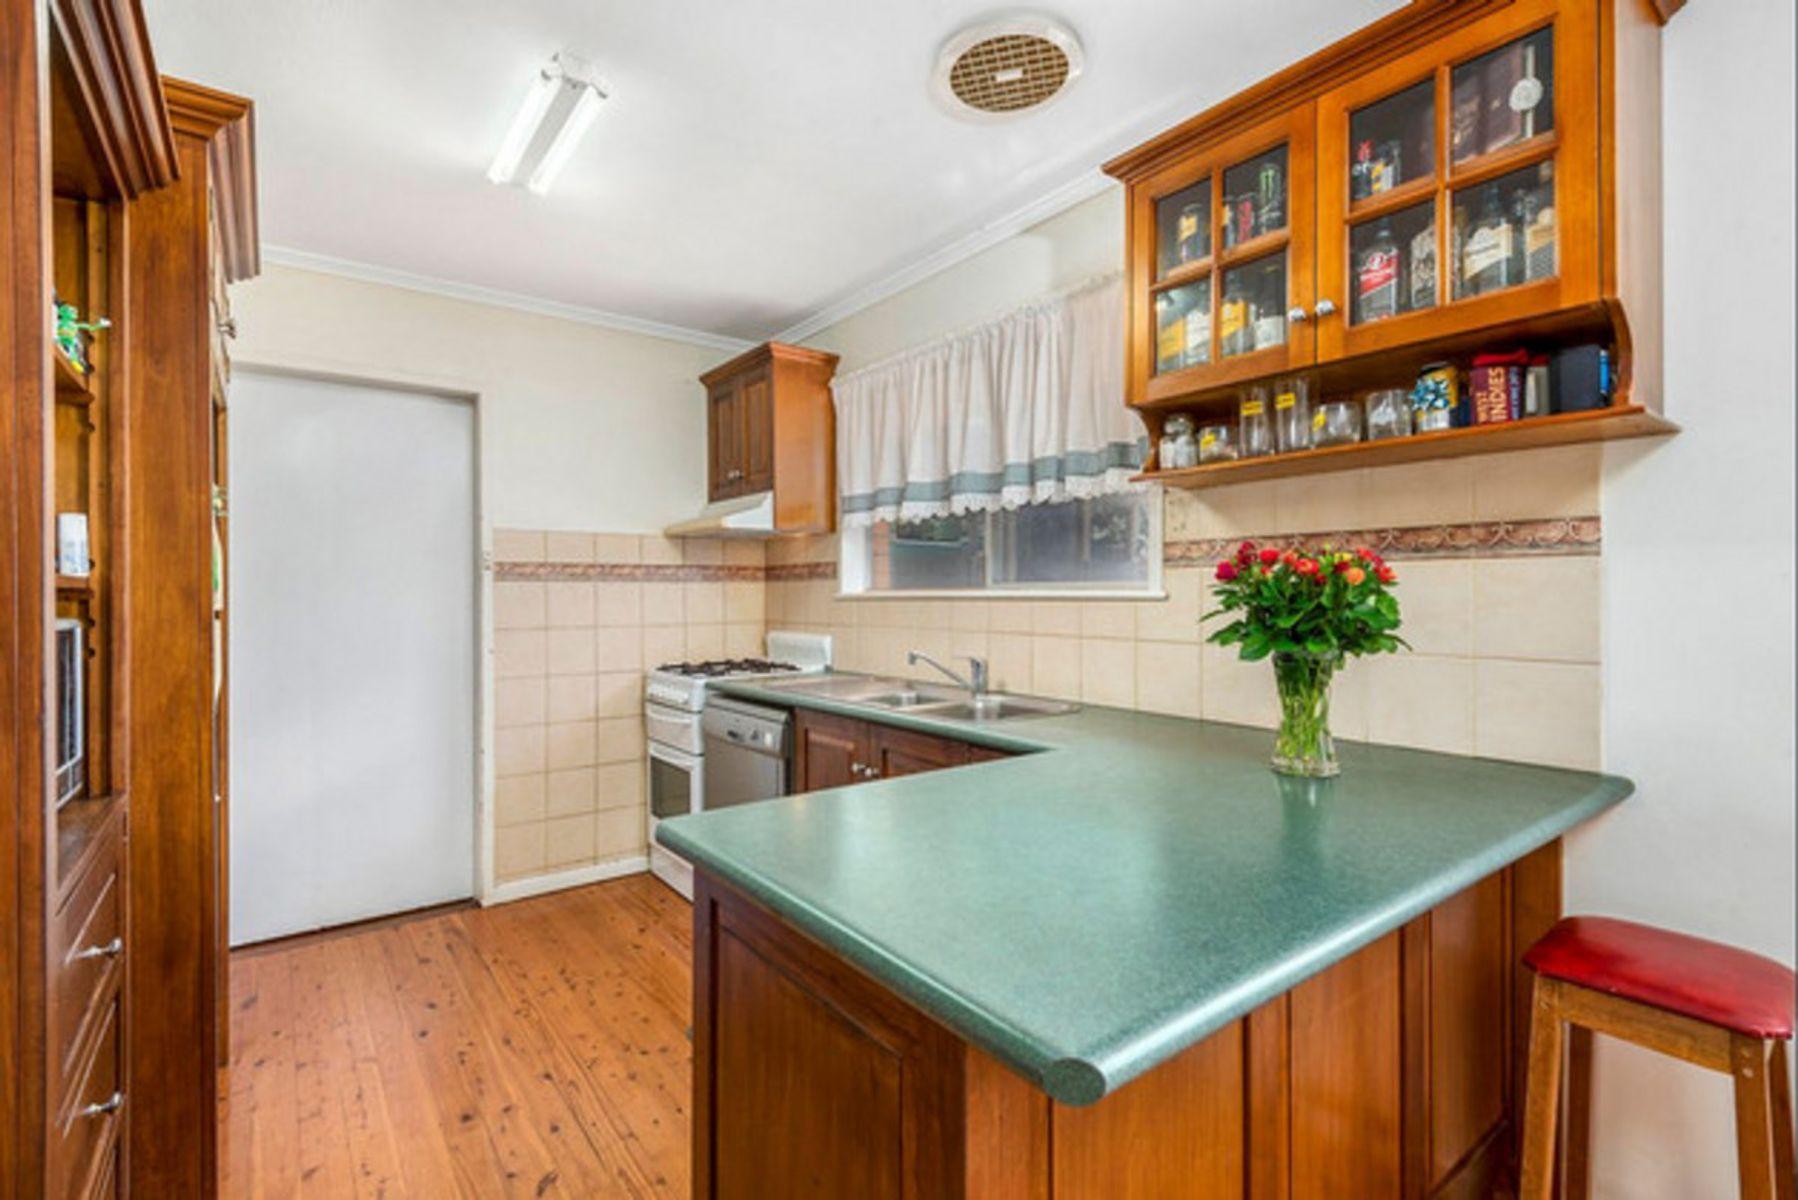 49 Debra Street, Centenary Heights, QLD 4350